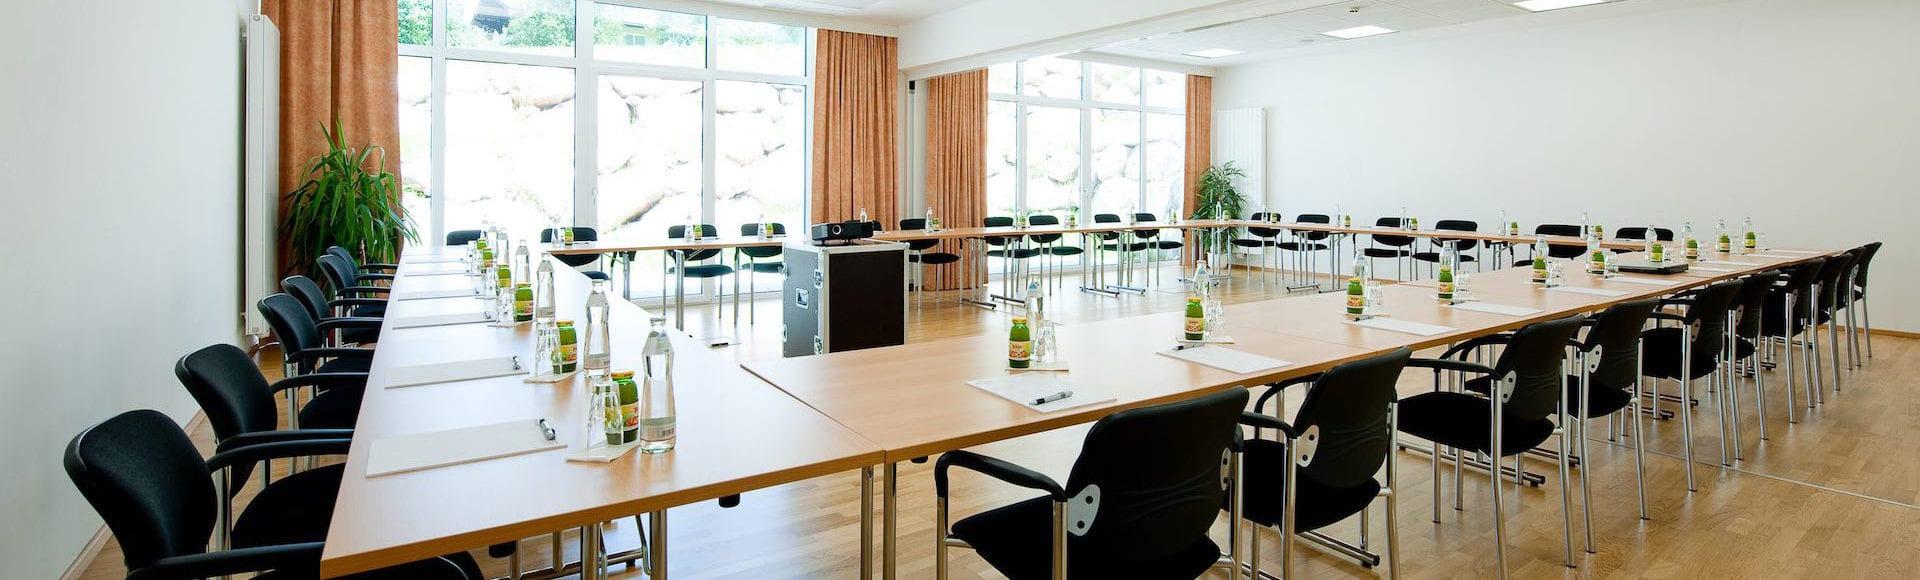 Seminarhotel in Salzburg